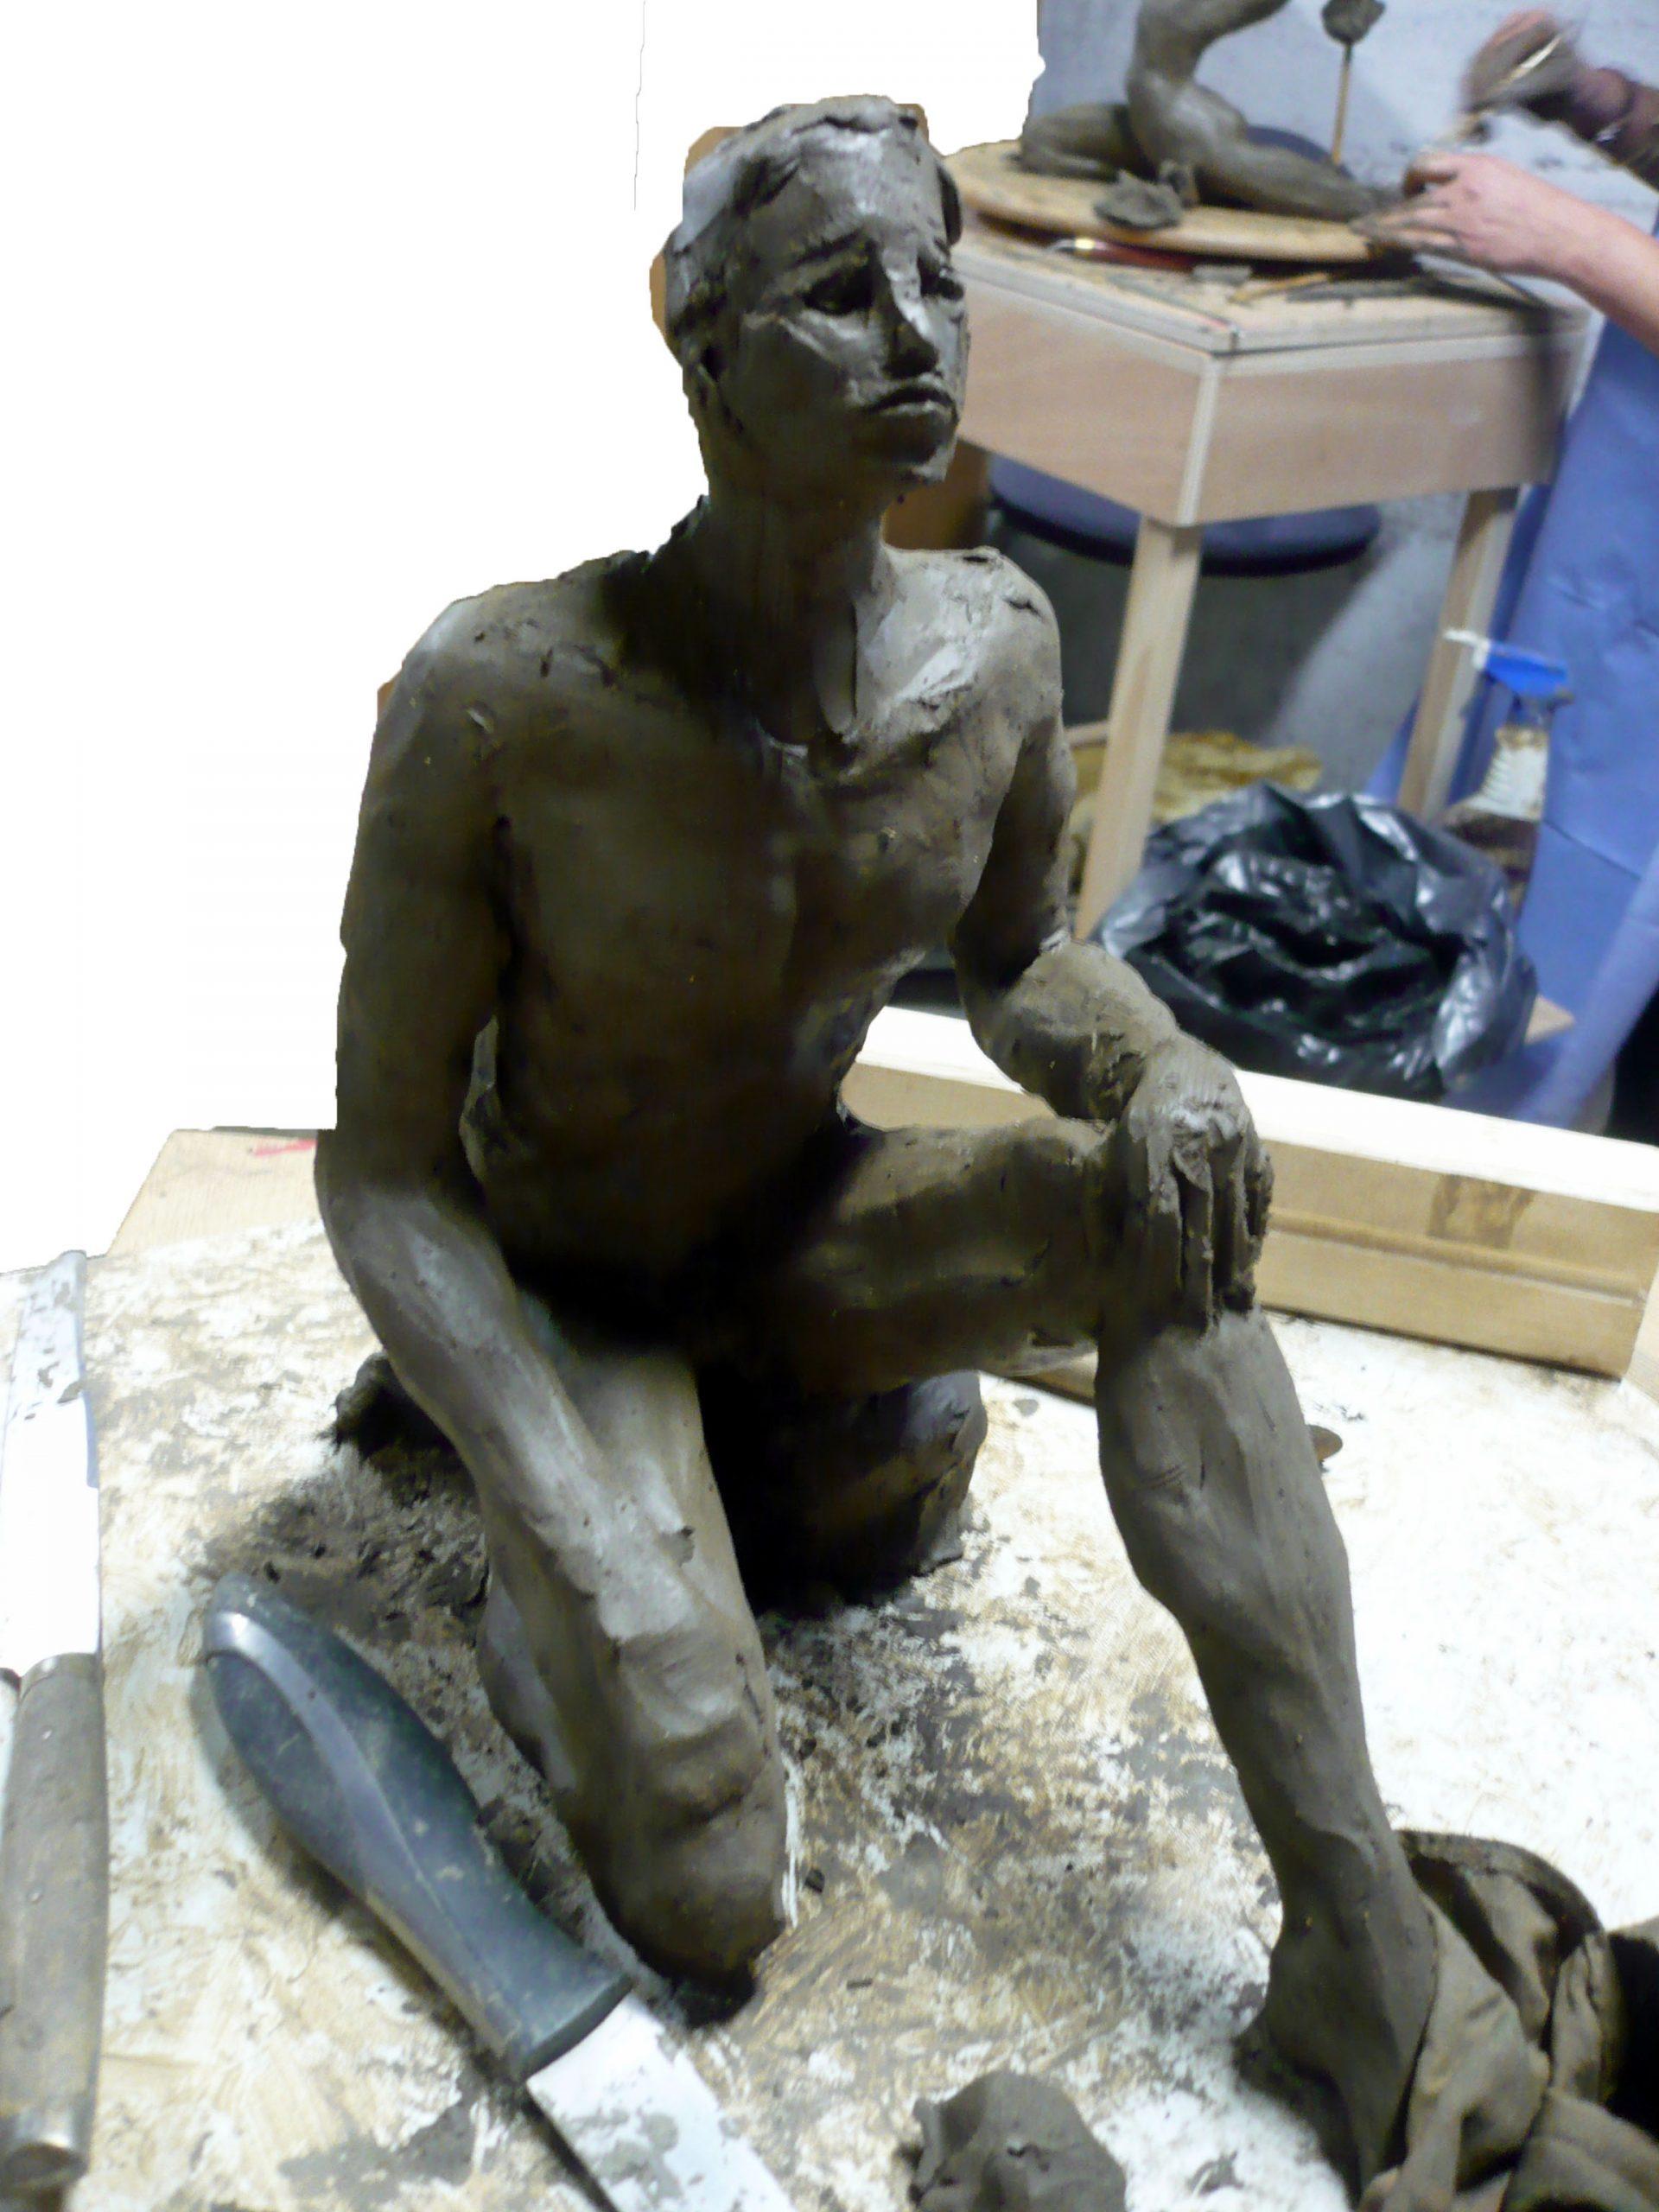 Atelier creatif - Atelier Modelage - Gissinger Mariele – Sculpture – Bronzes – Modelage – Terre – Ton - Céramique – Porcelaine – Porcelain – Artiste - Art-gm – Alsace – France